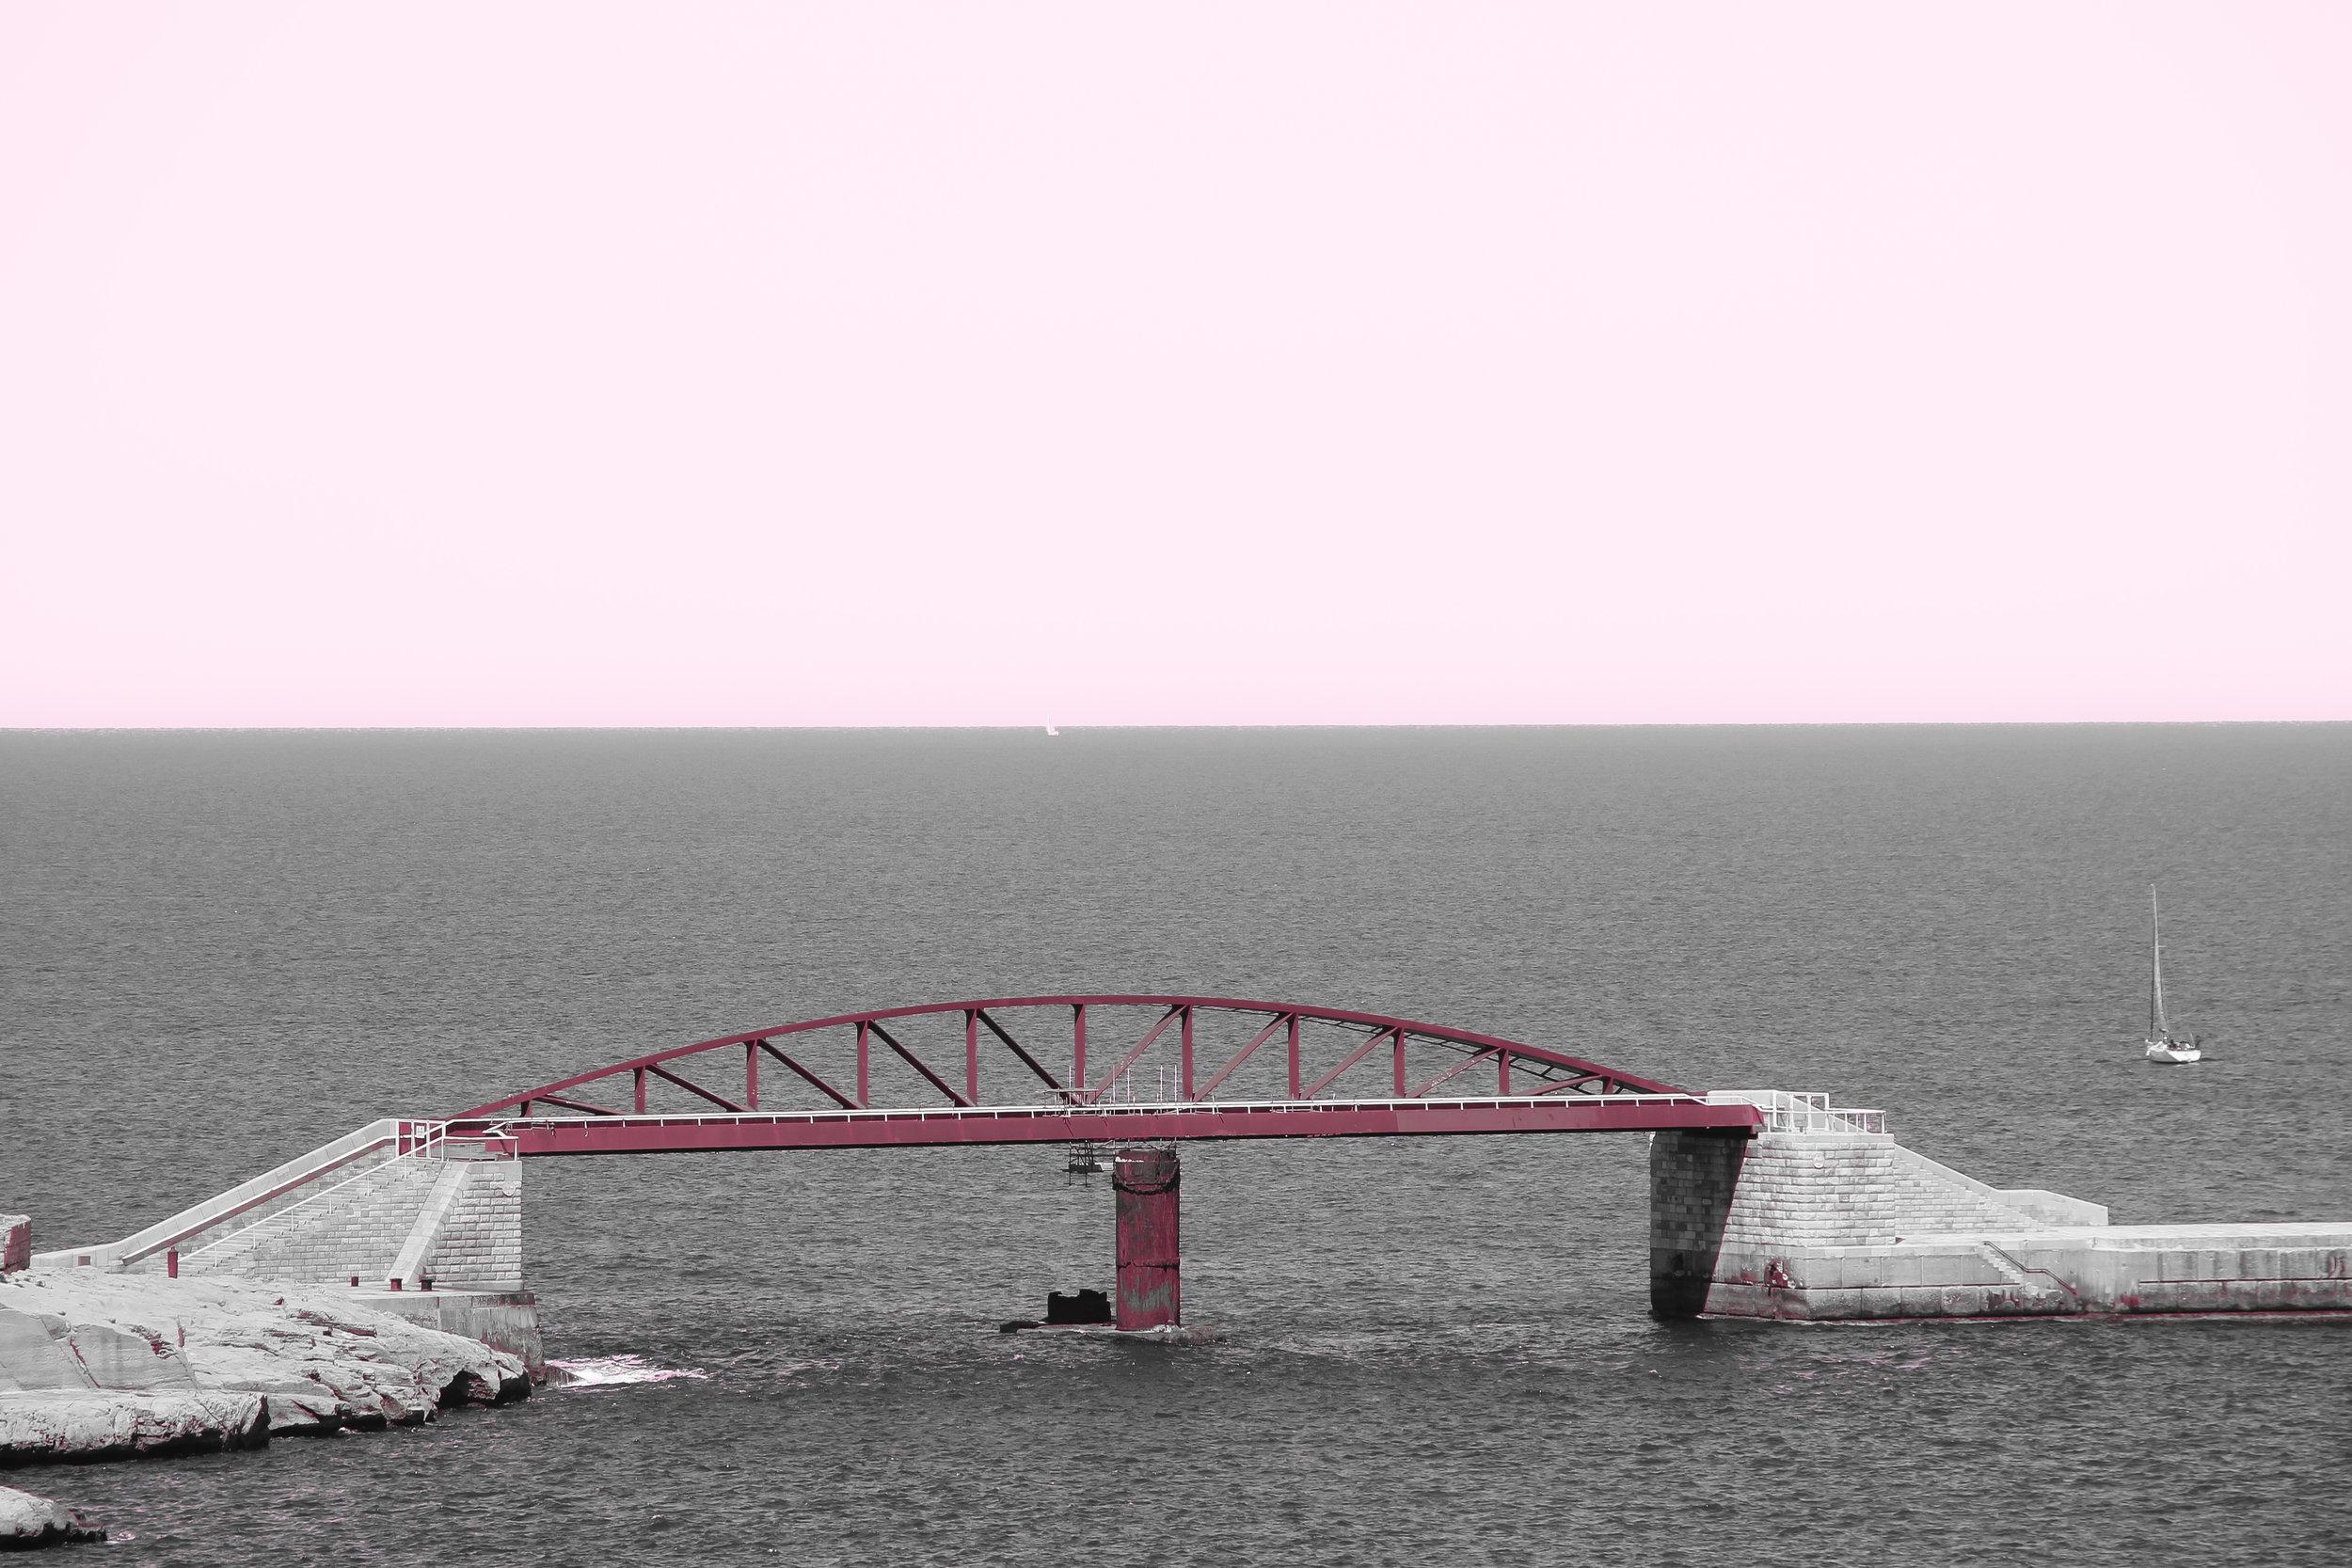 St Elmo Breakwater Bridge | the Mediterranean Sea | Valletta | - Thinking About Appreciation For Quality In Malta | Malta, Europe | DoLessGetMoreDone.com | - Canon Minimal Travel Documentary Photography | Fine Art Photography - search for liveability | Sustainability